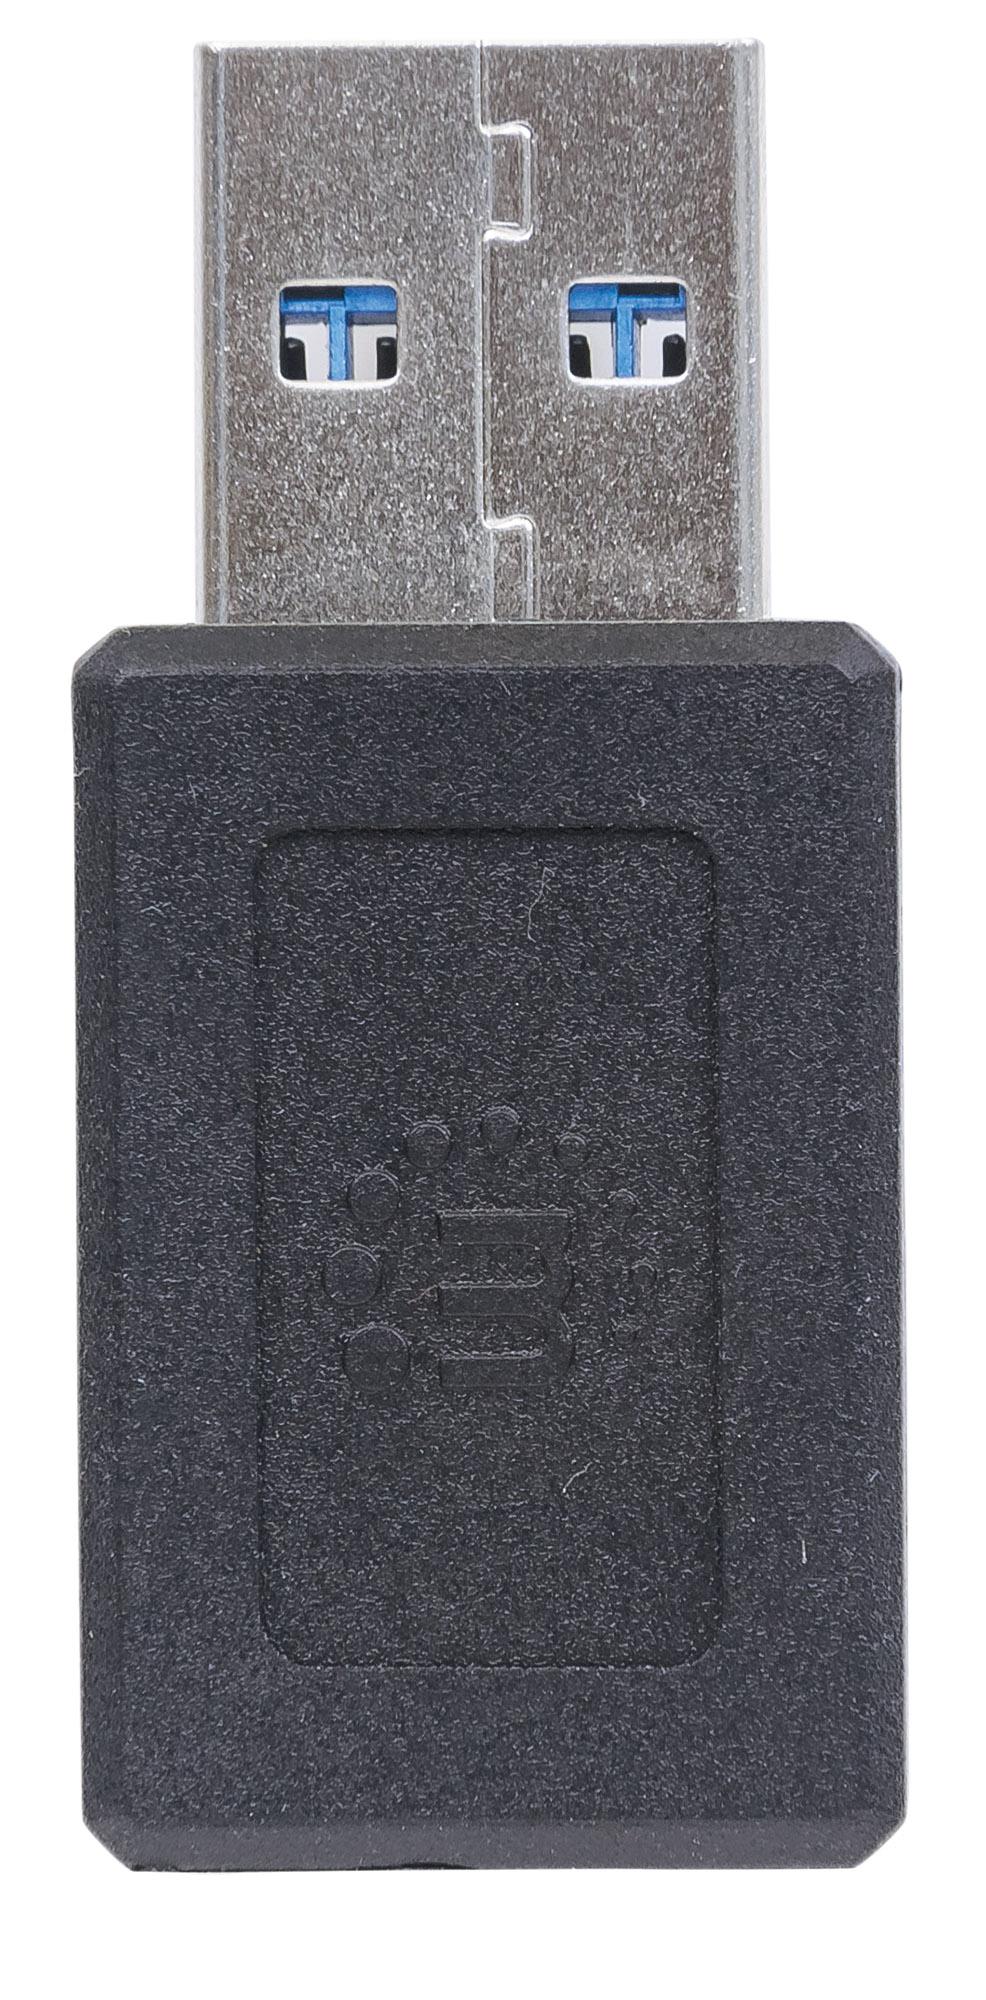 SuperSpeed+ USB C Adapter